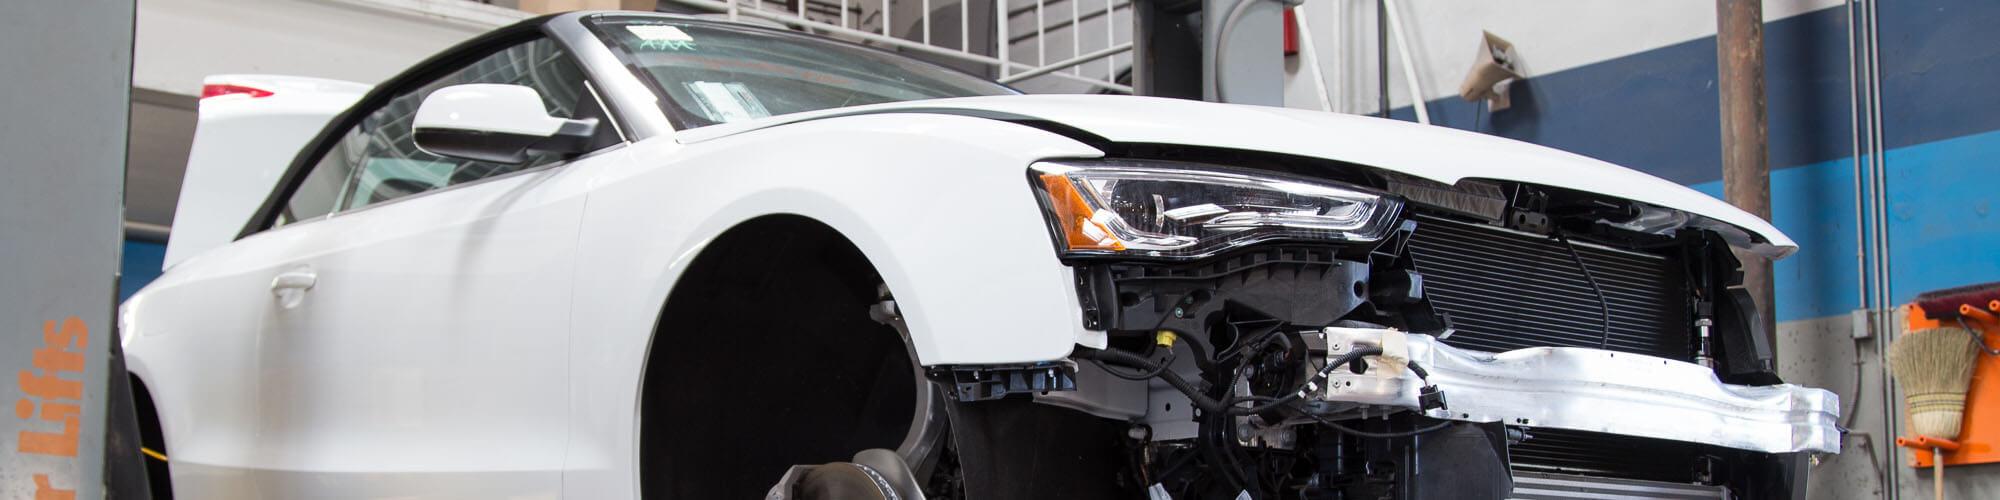 Amatos Auto Body Factory Authorized Certified San Diego Audi S - Audi auto body